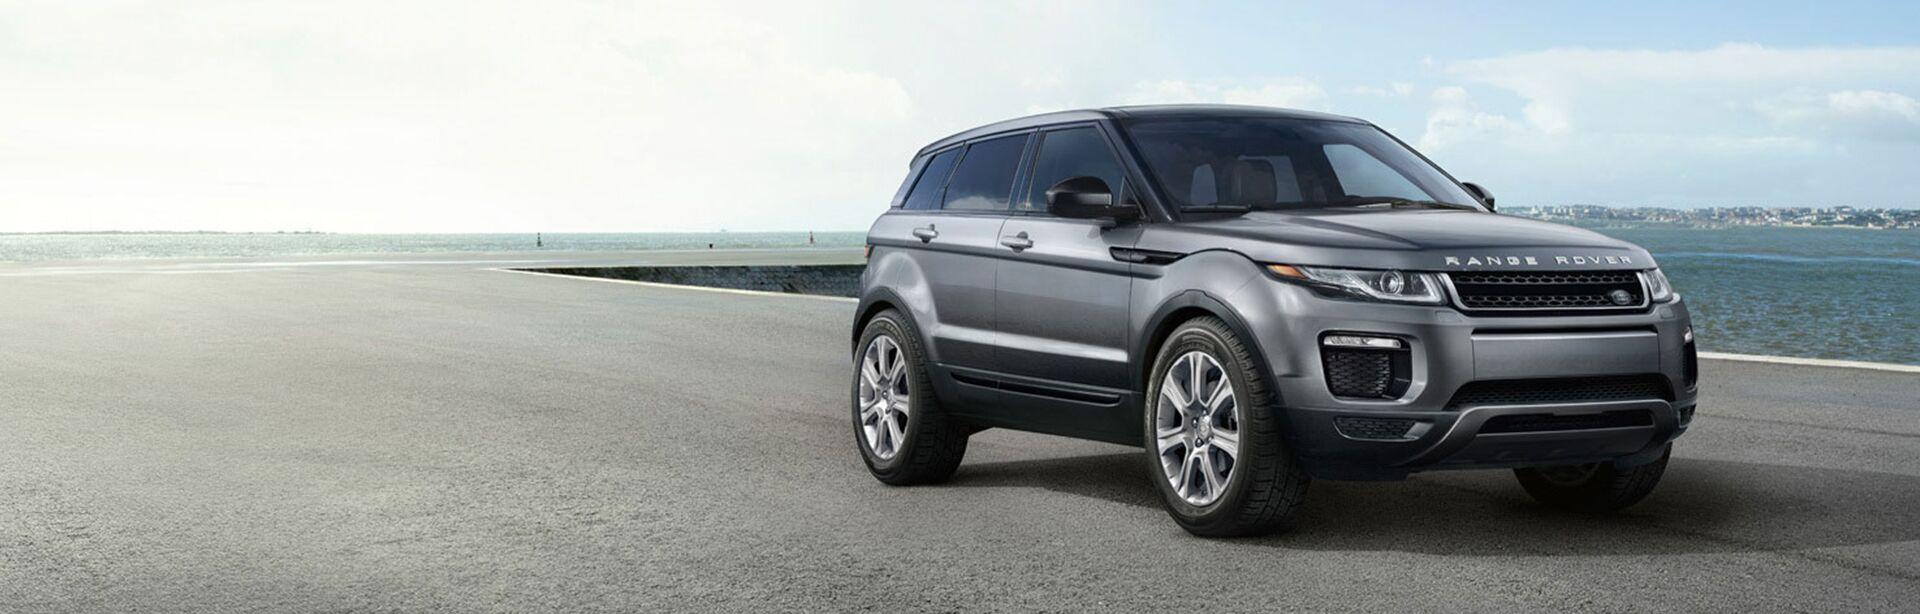 2018 Land Rover Range Rover Evoque 5 Door SE Premium